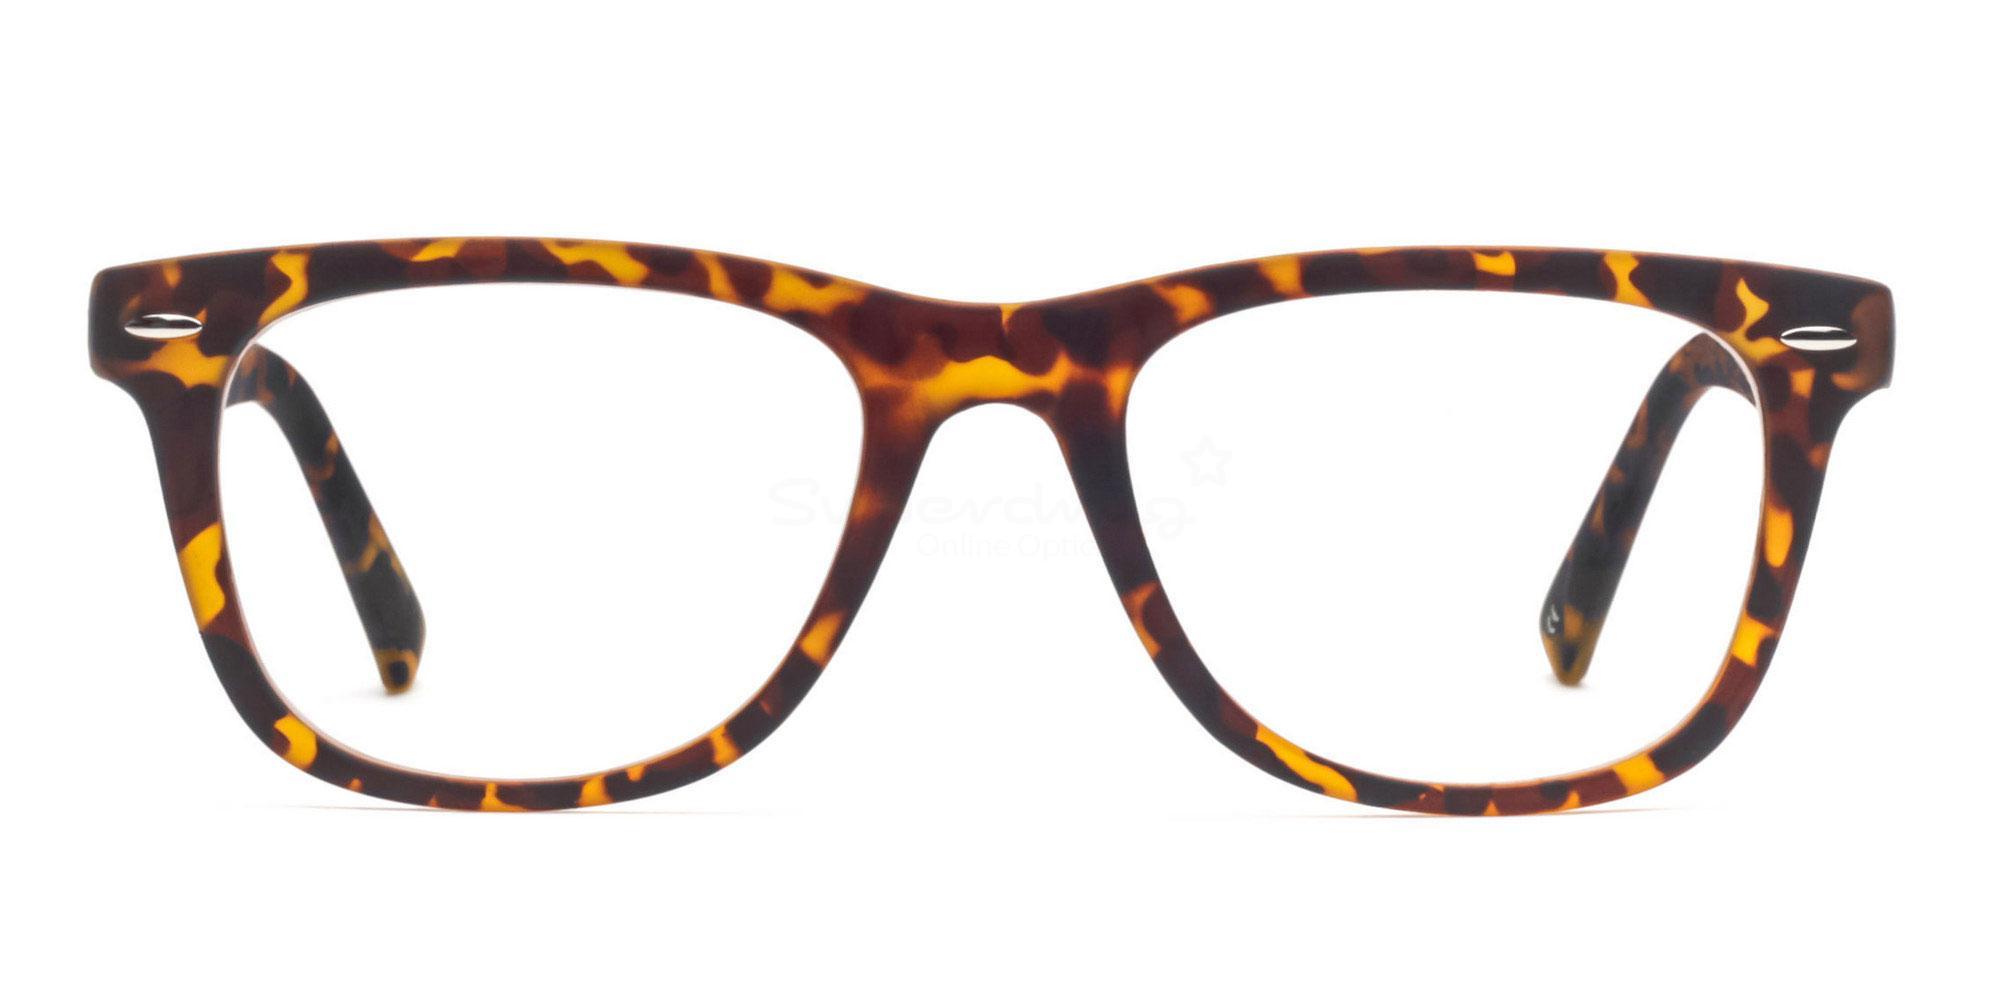 C9 8121 - Tortoise Glasses, Helium